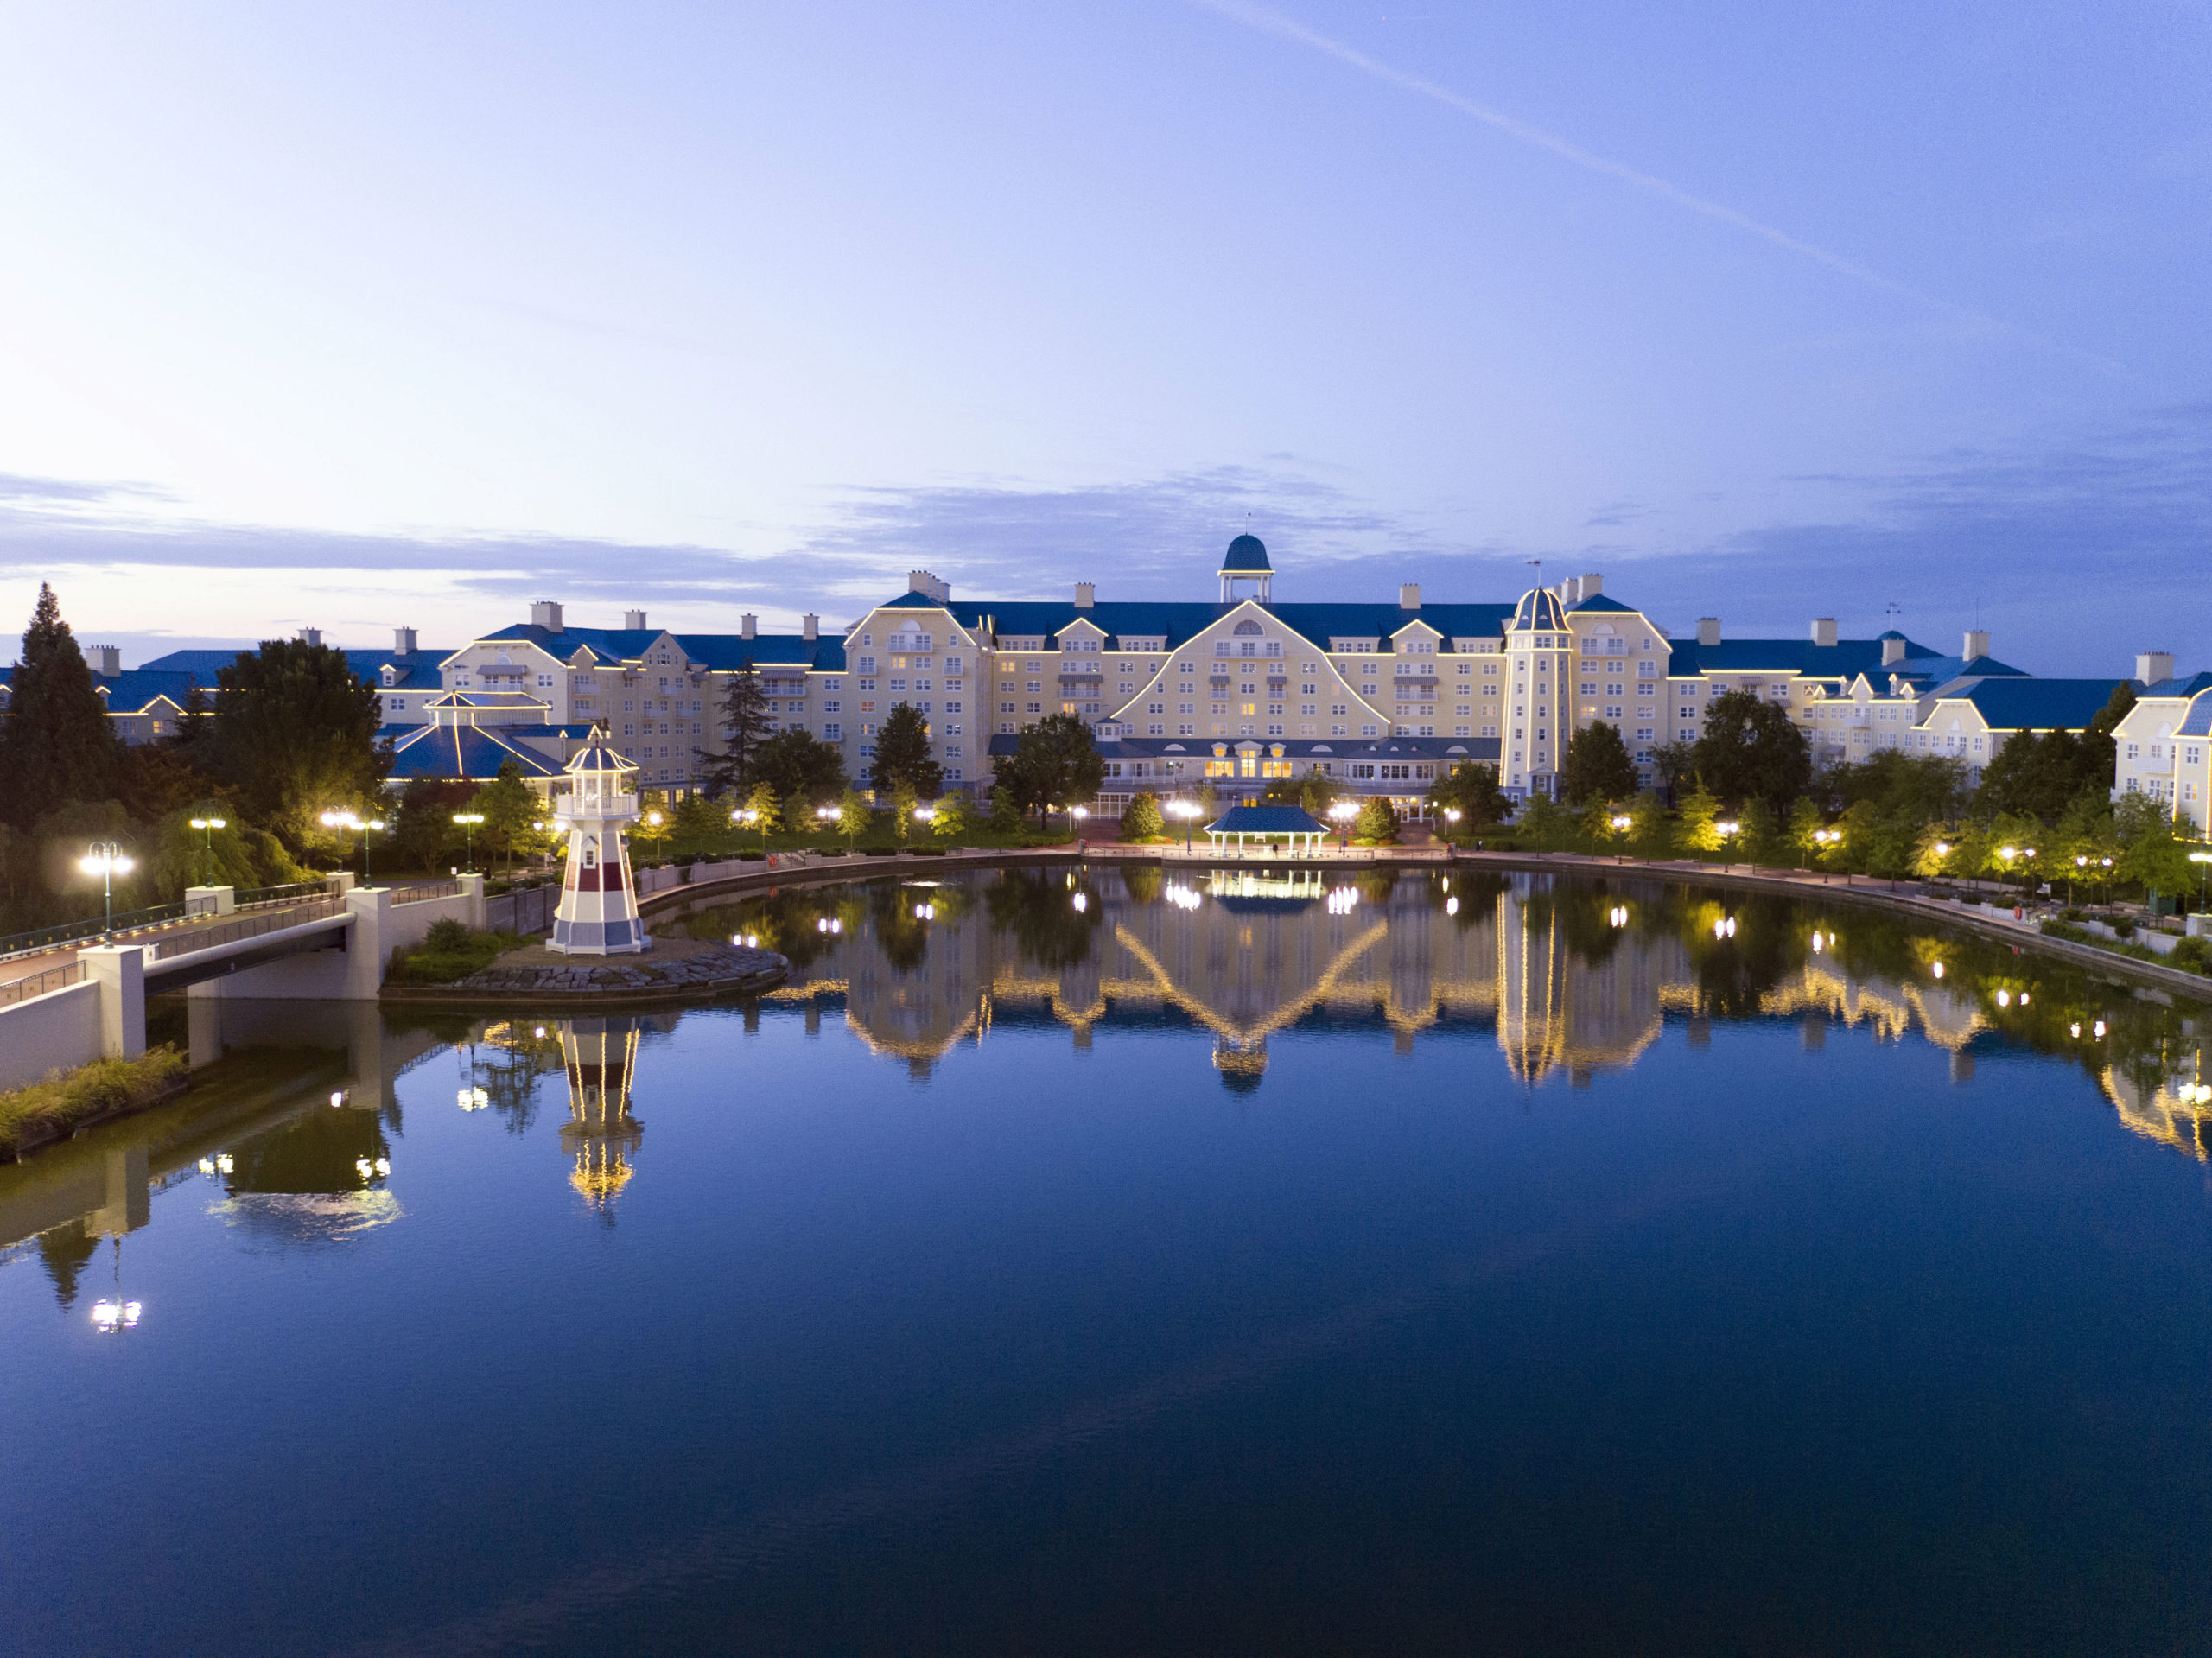 Riapertura di Disneyland Paris - Pagina 2 Disney43